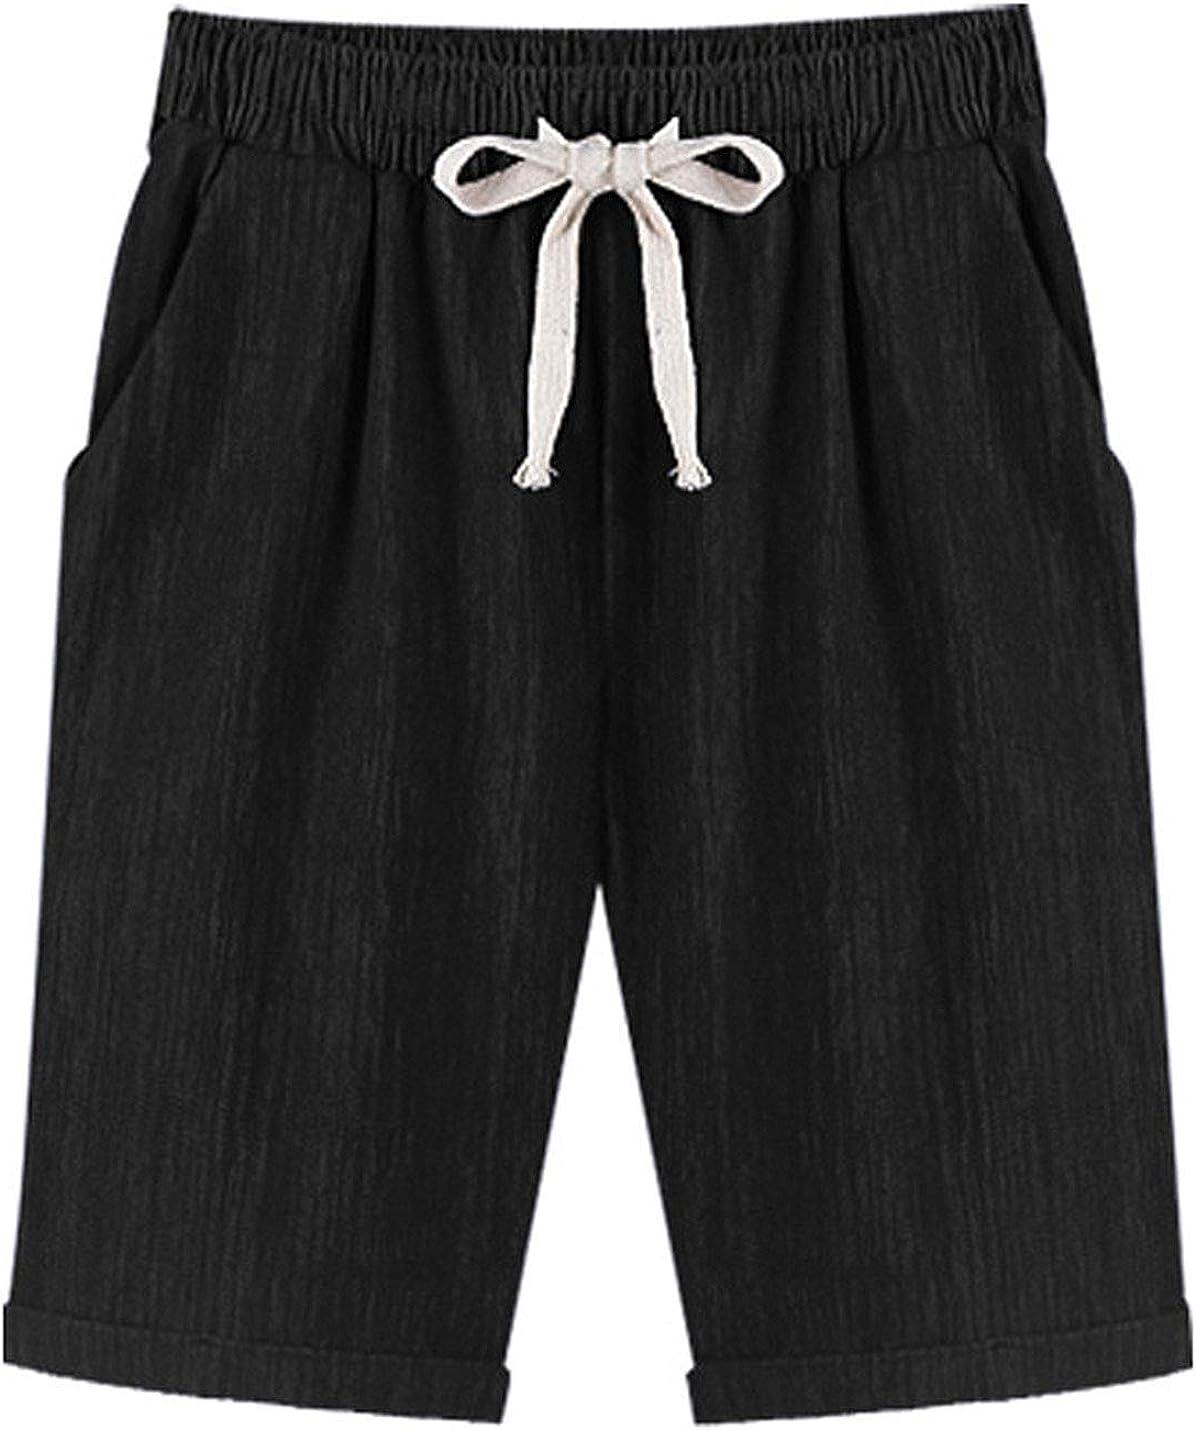 PUWEI Womens Drawstring Elastic Waist Strech Denim Loose A Line BF Rolled Shorts